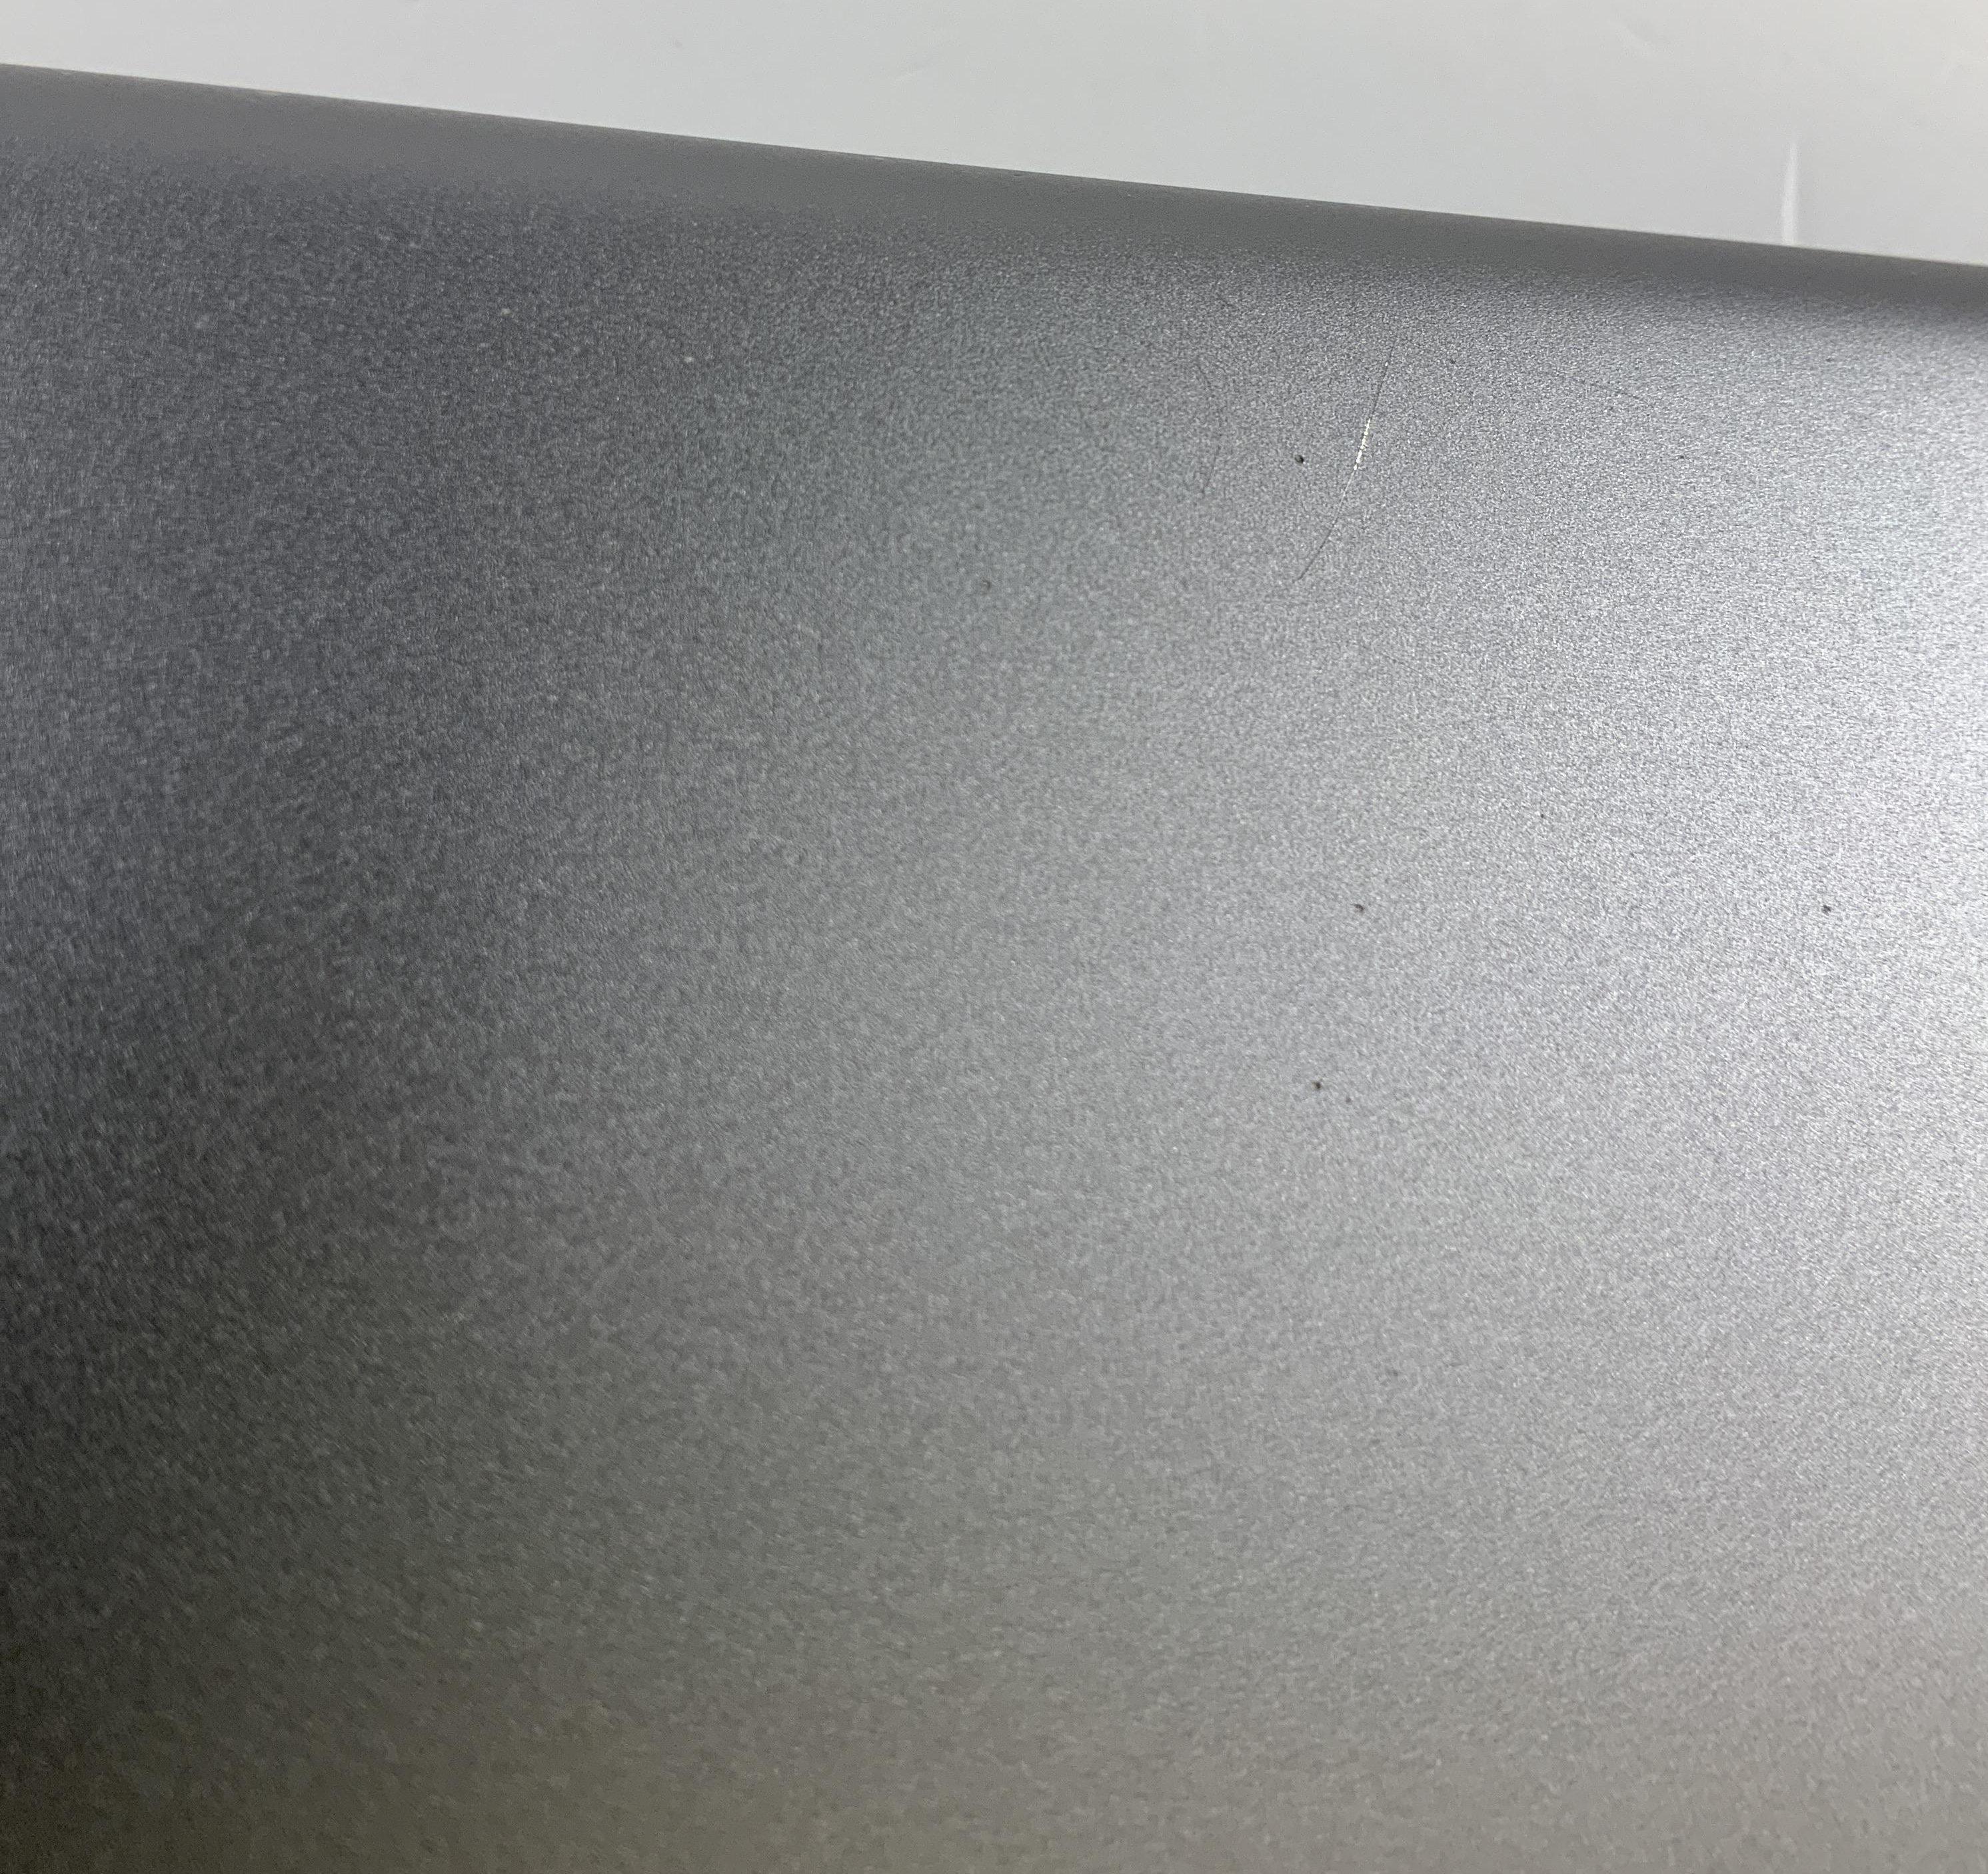 iPad 6 Wi-Fi 32GB, 32GB, Space Gray, bild 5